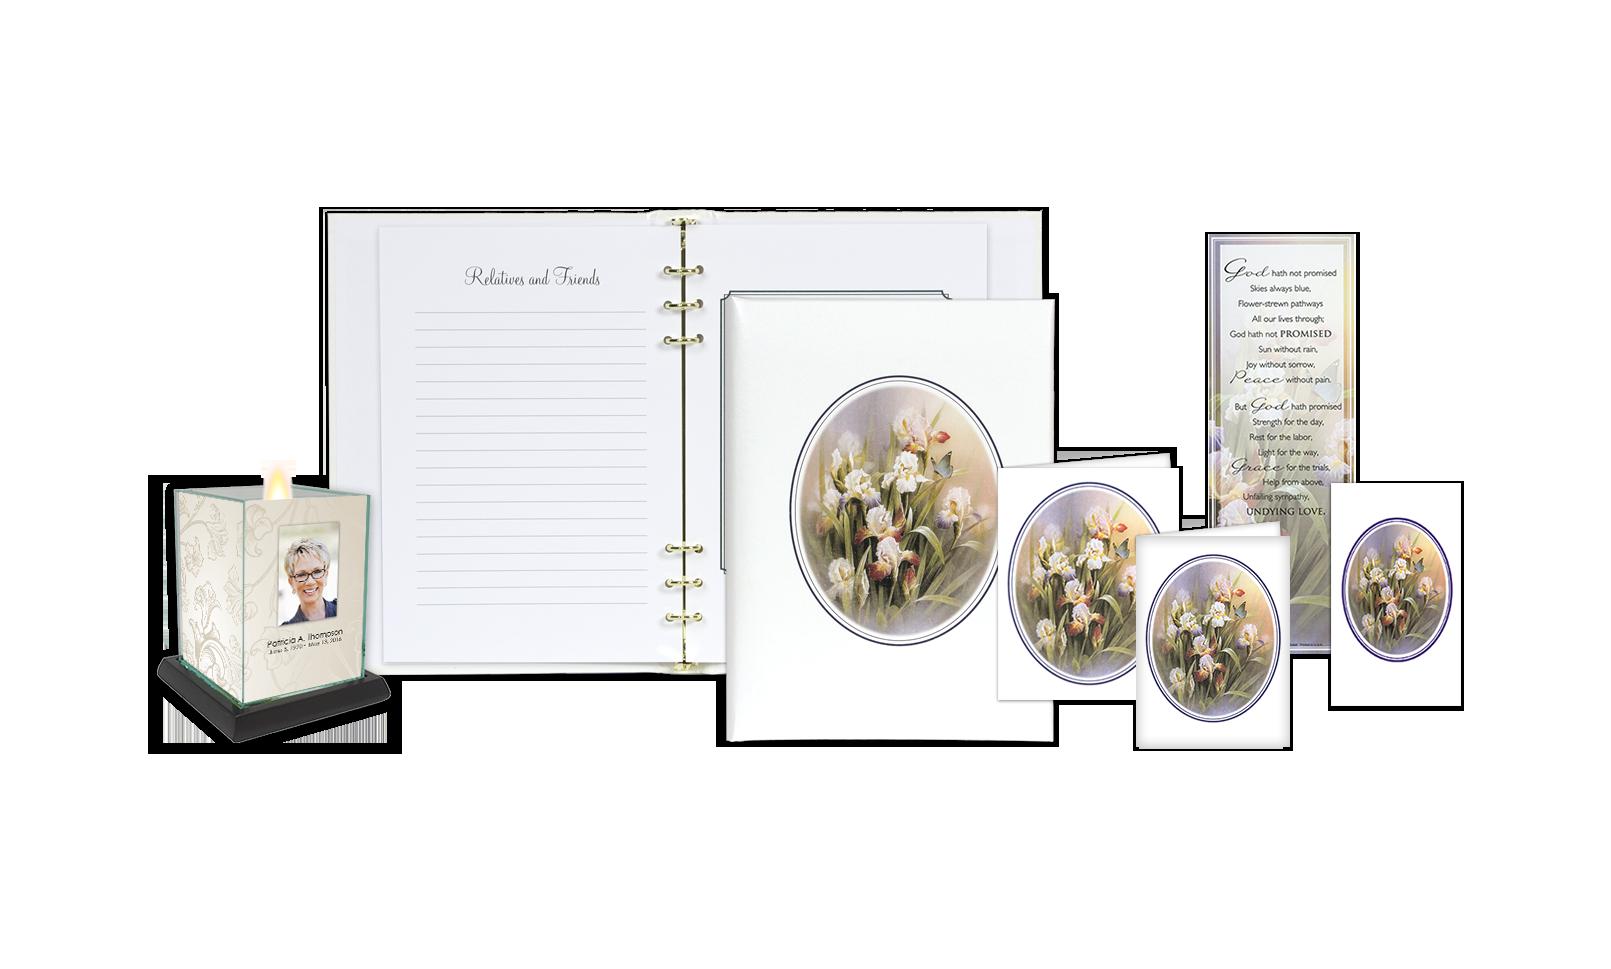 ROL Iris & Butterfly White Series 238 FS